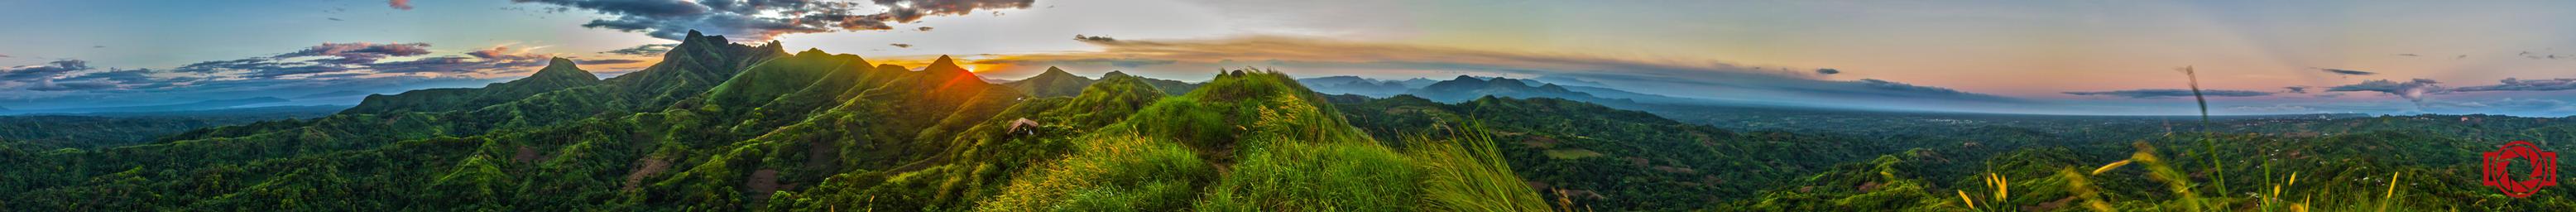 Sunset at Mt. Batulao by JdelosSantos